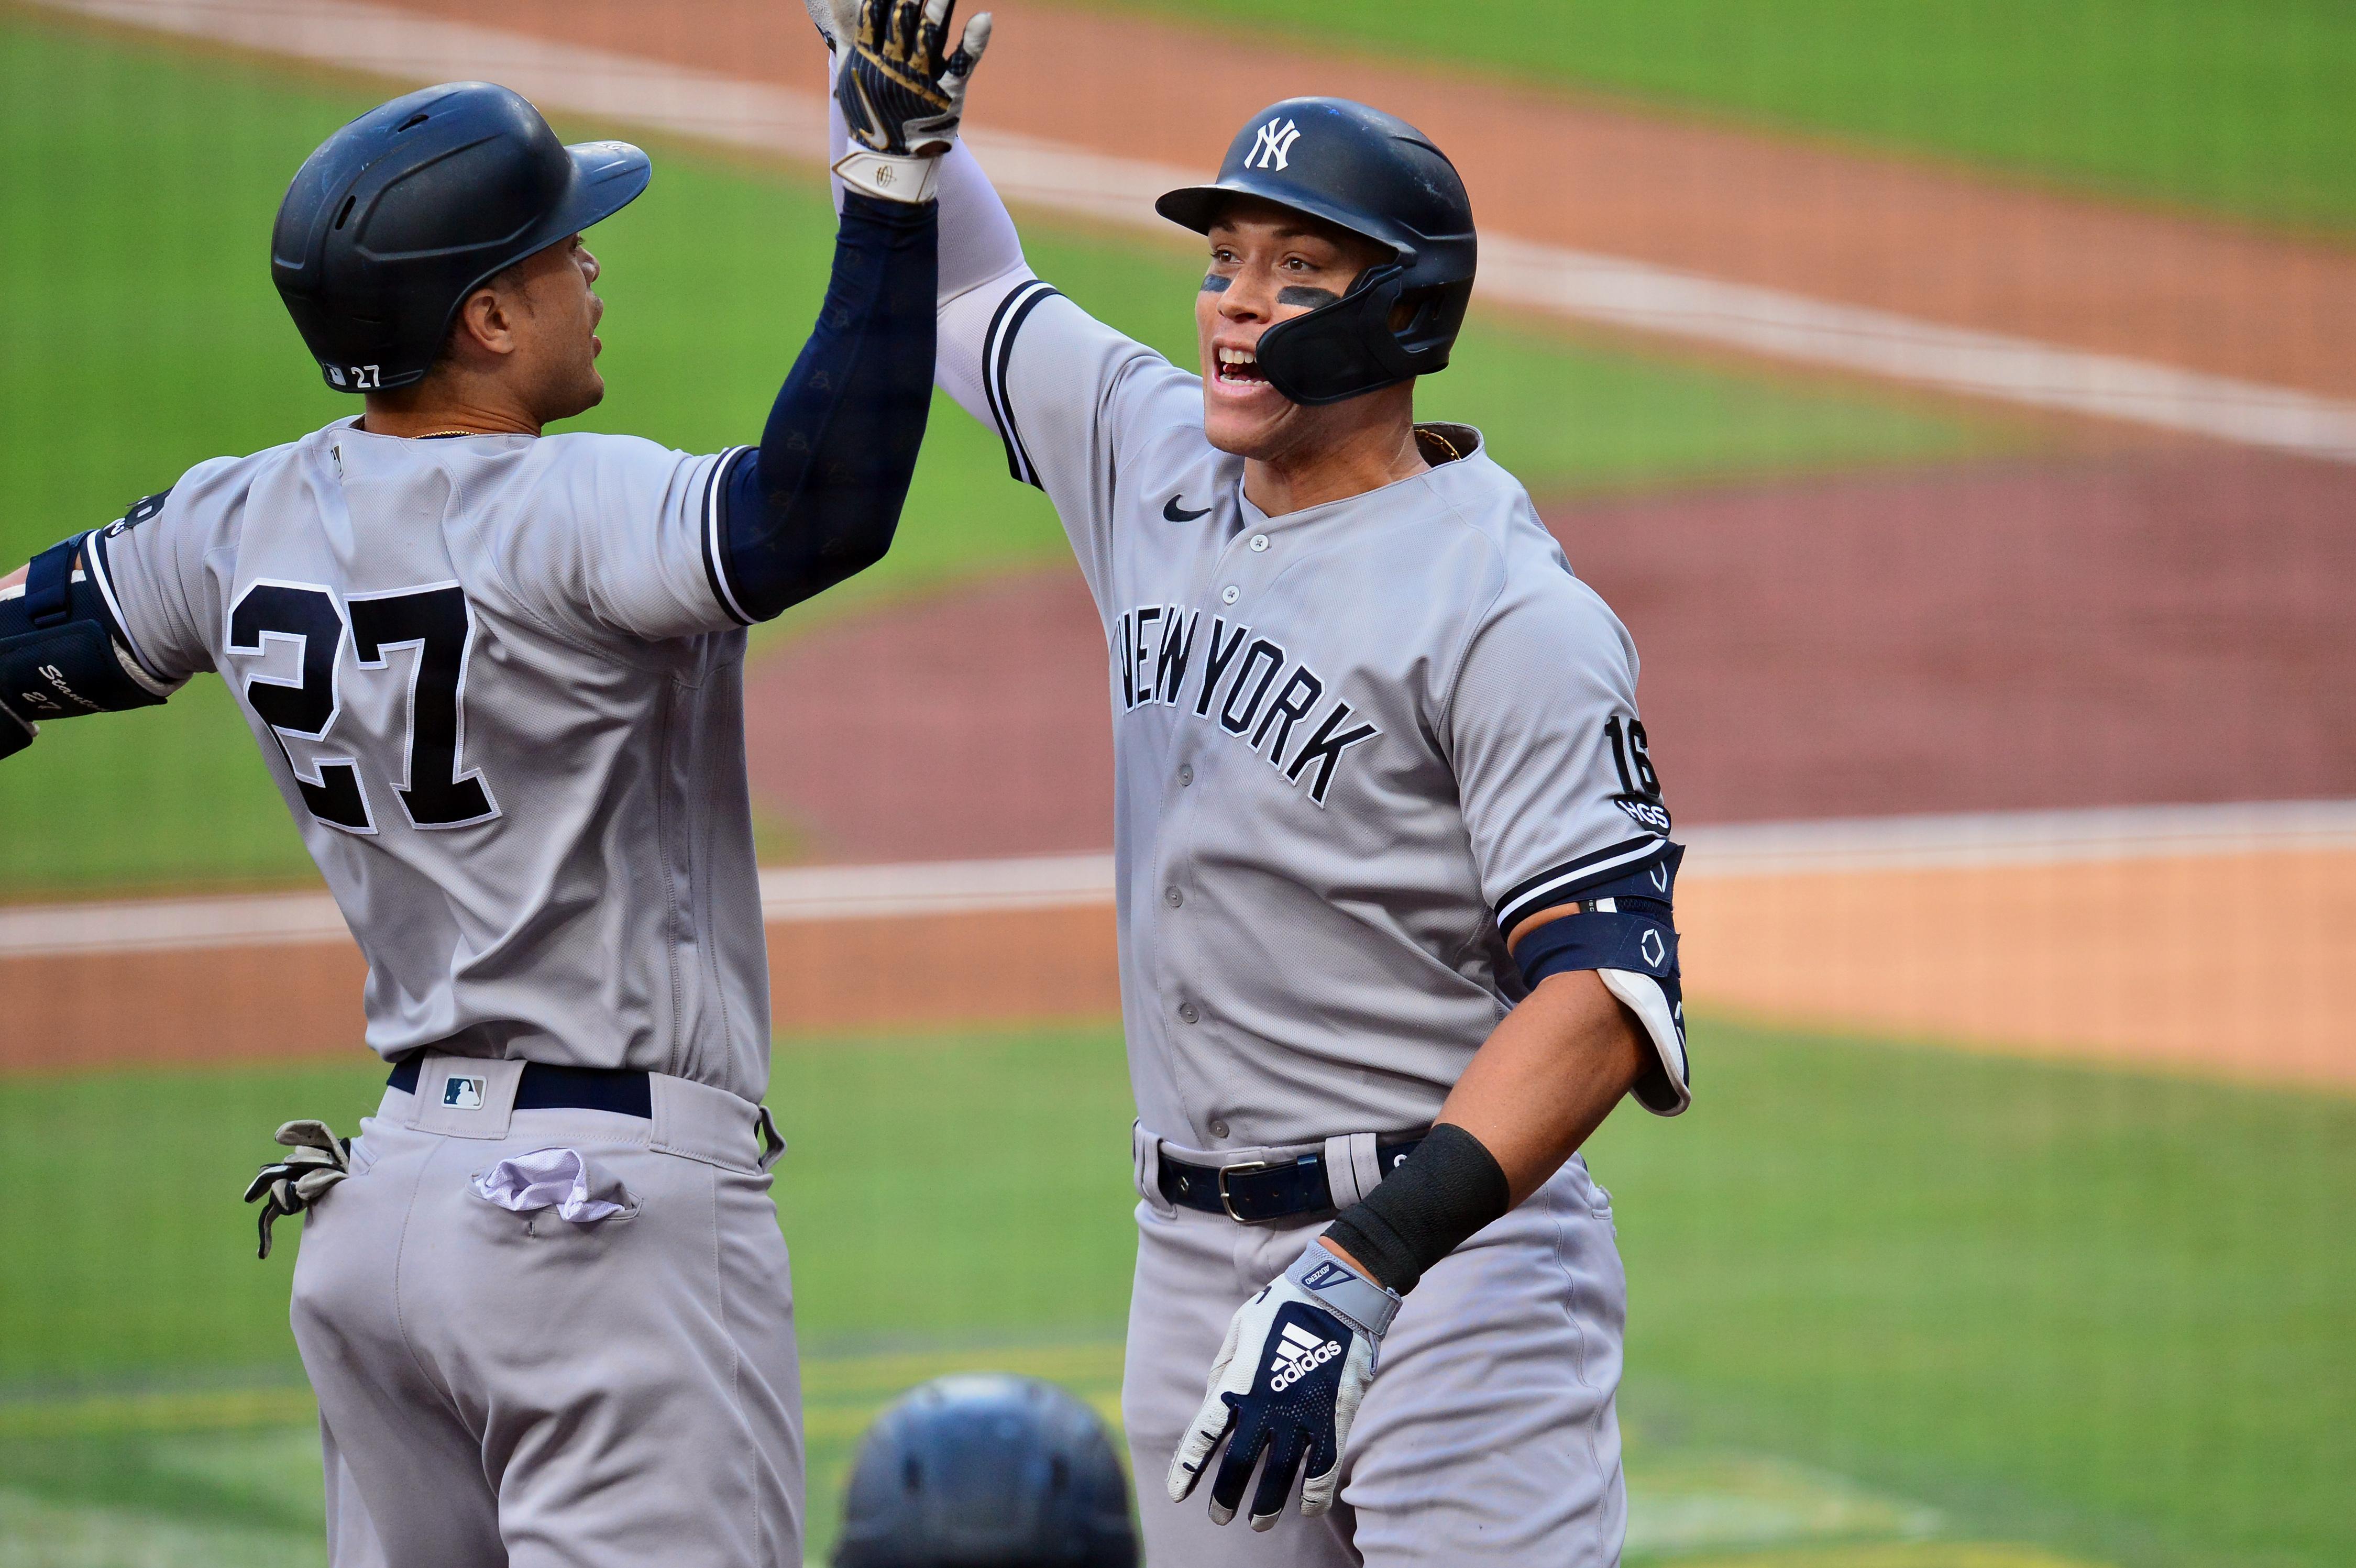 New York Yankees, NYY, Aaron Judge, Giancarlo Stanton